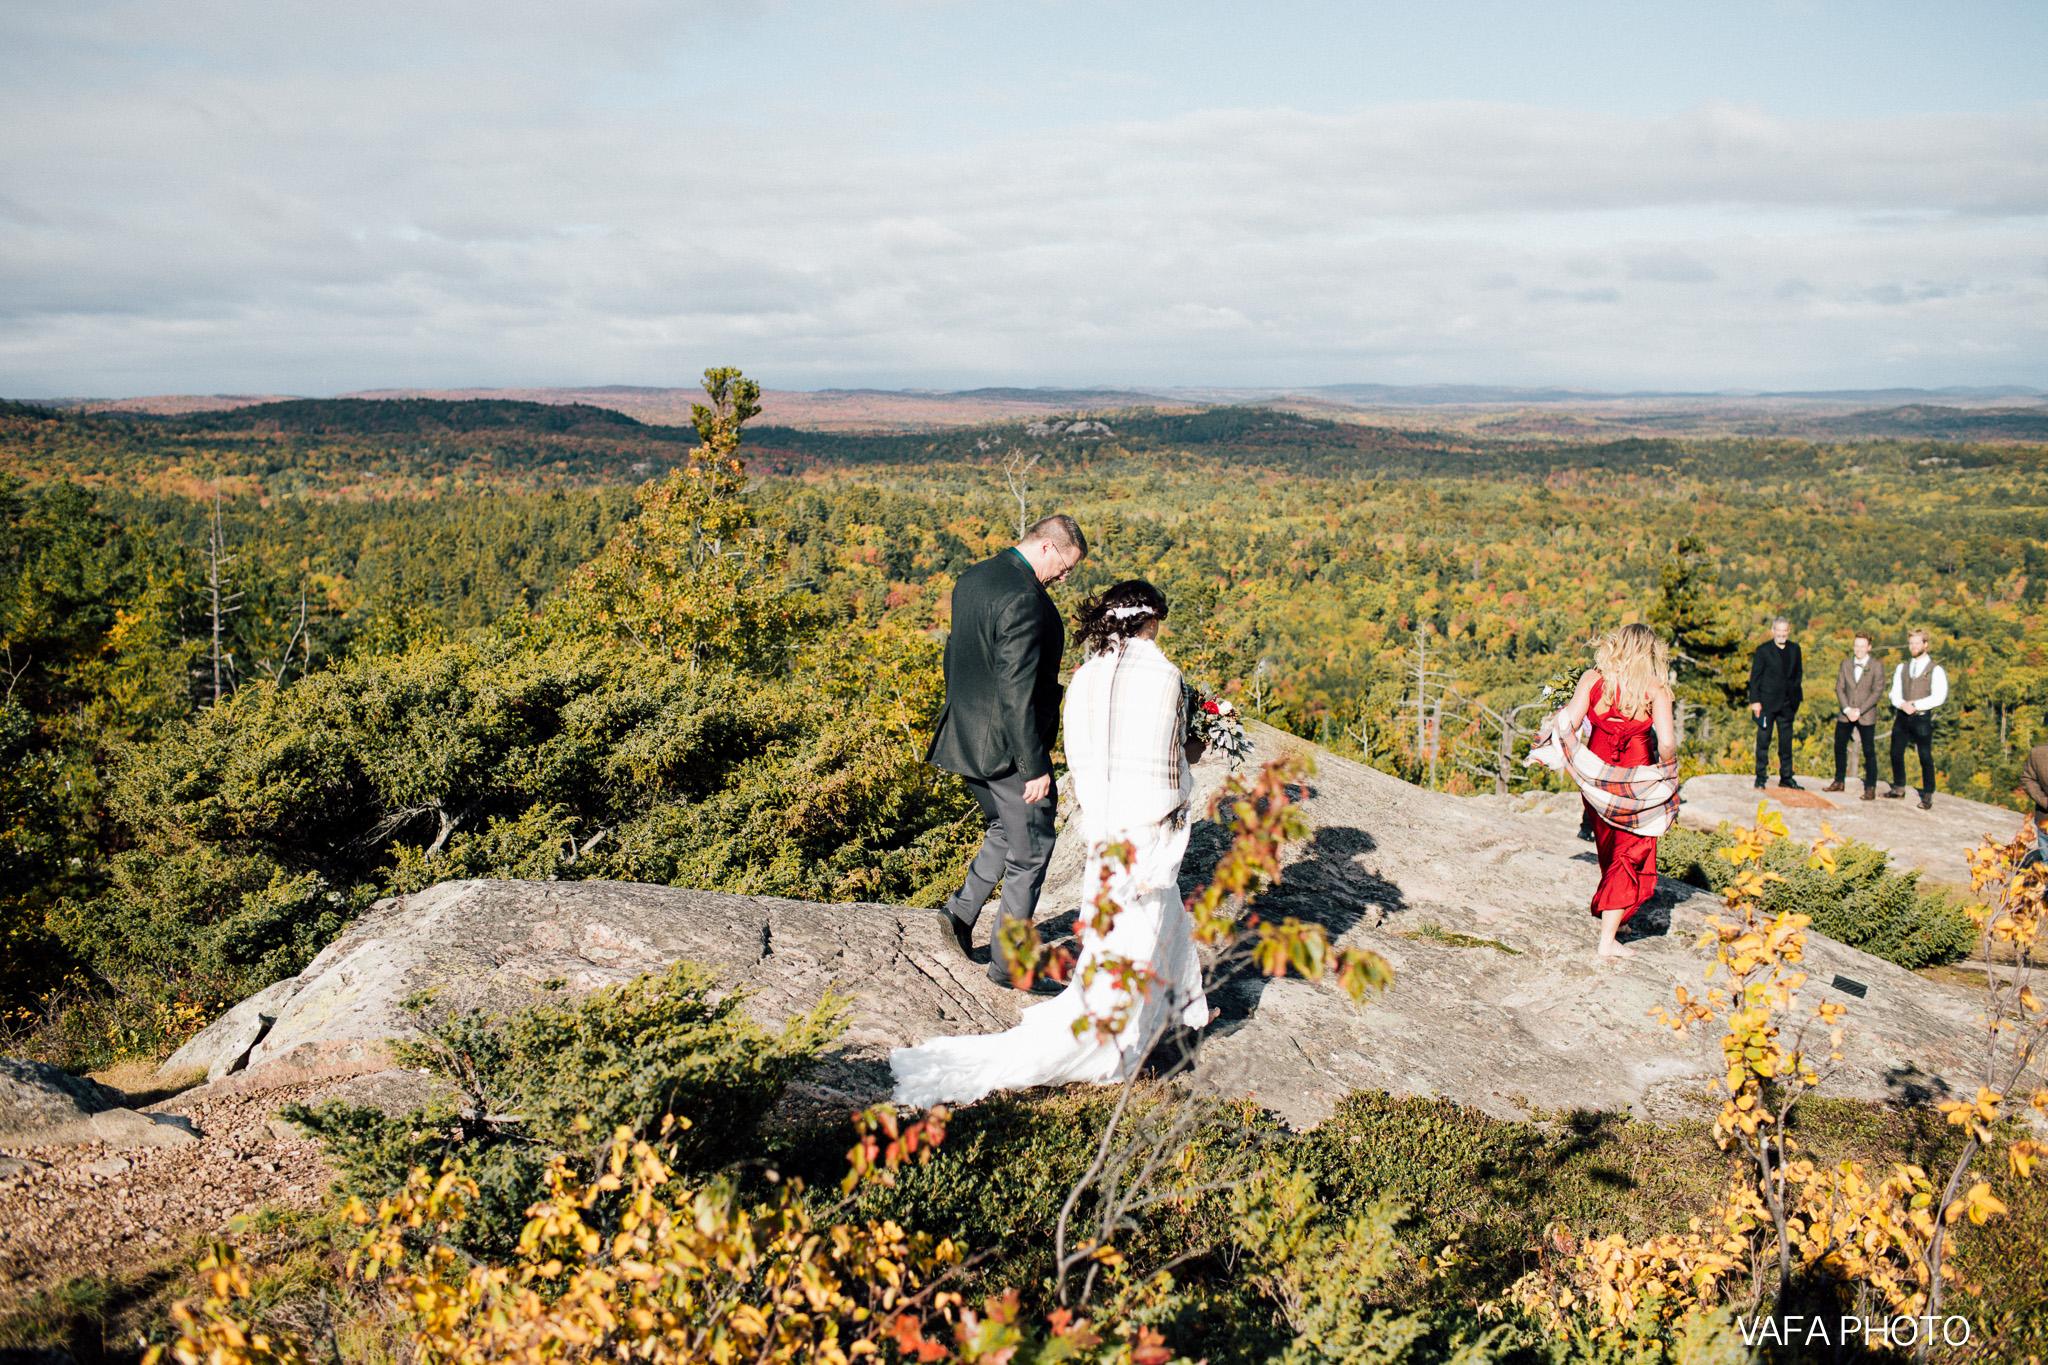 Hogback-Mountain-Wedding-Chelsea-Josh-Vafa-Photo-178.jpg